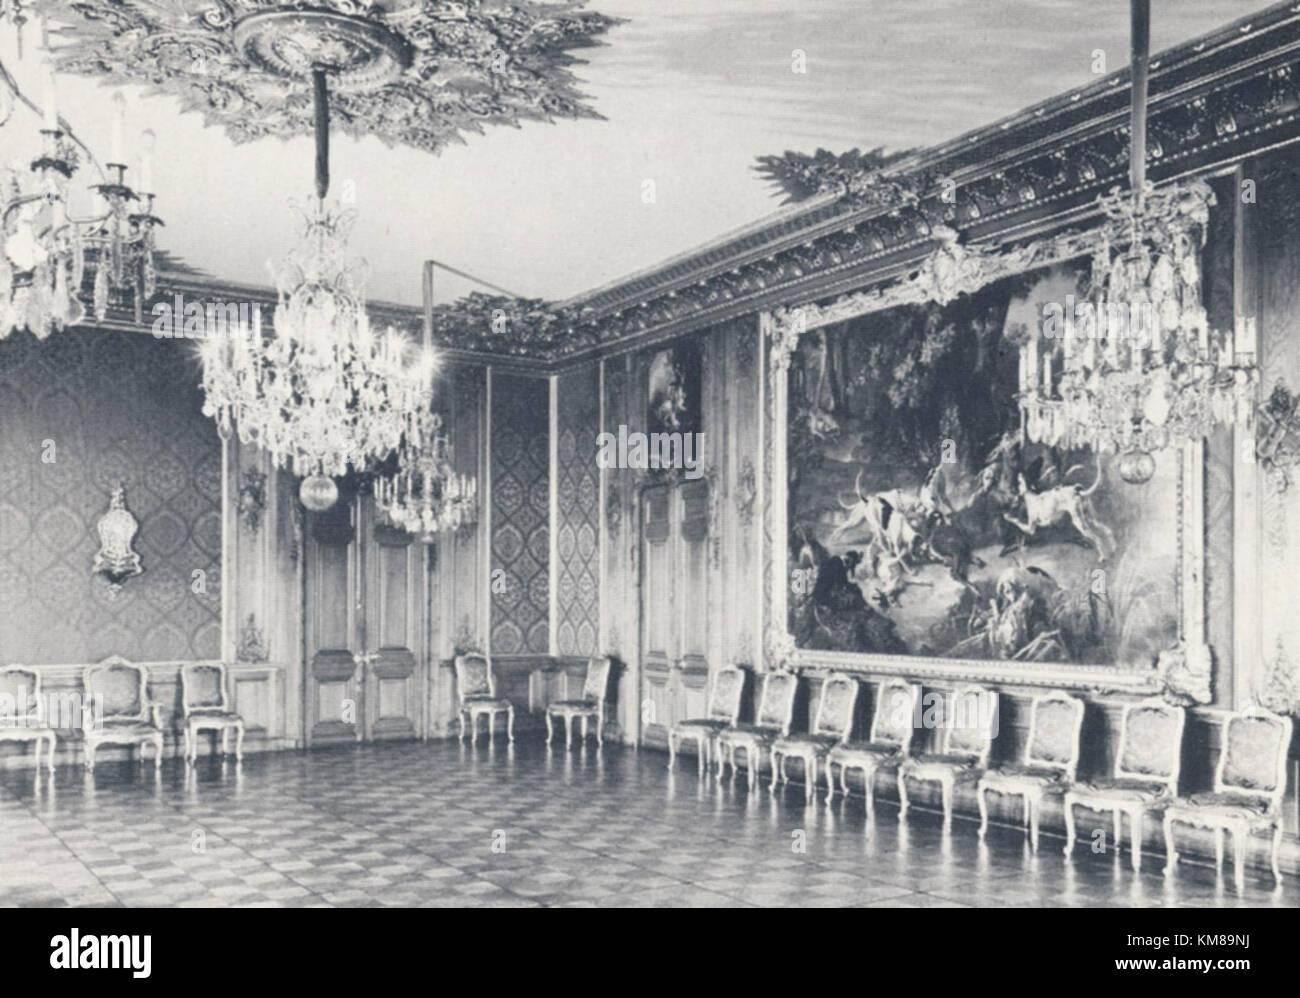 Lovisa Ulrikas matsal 1950 - Stock Image